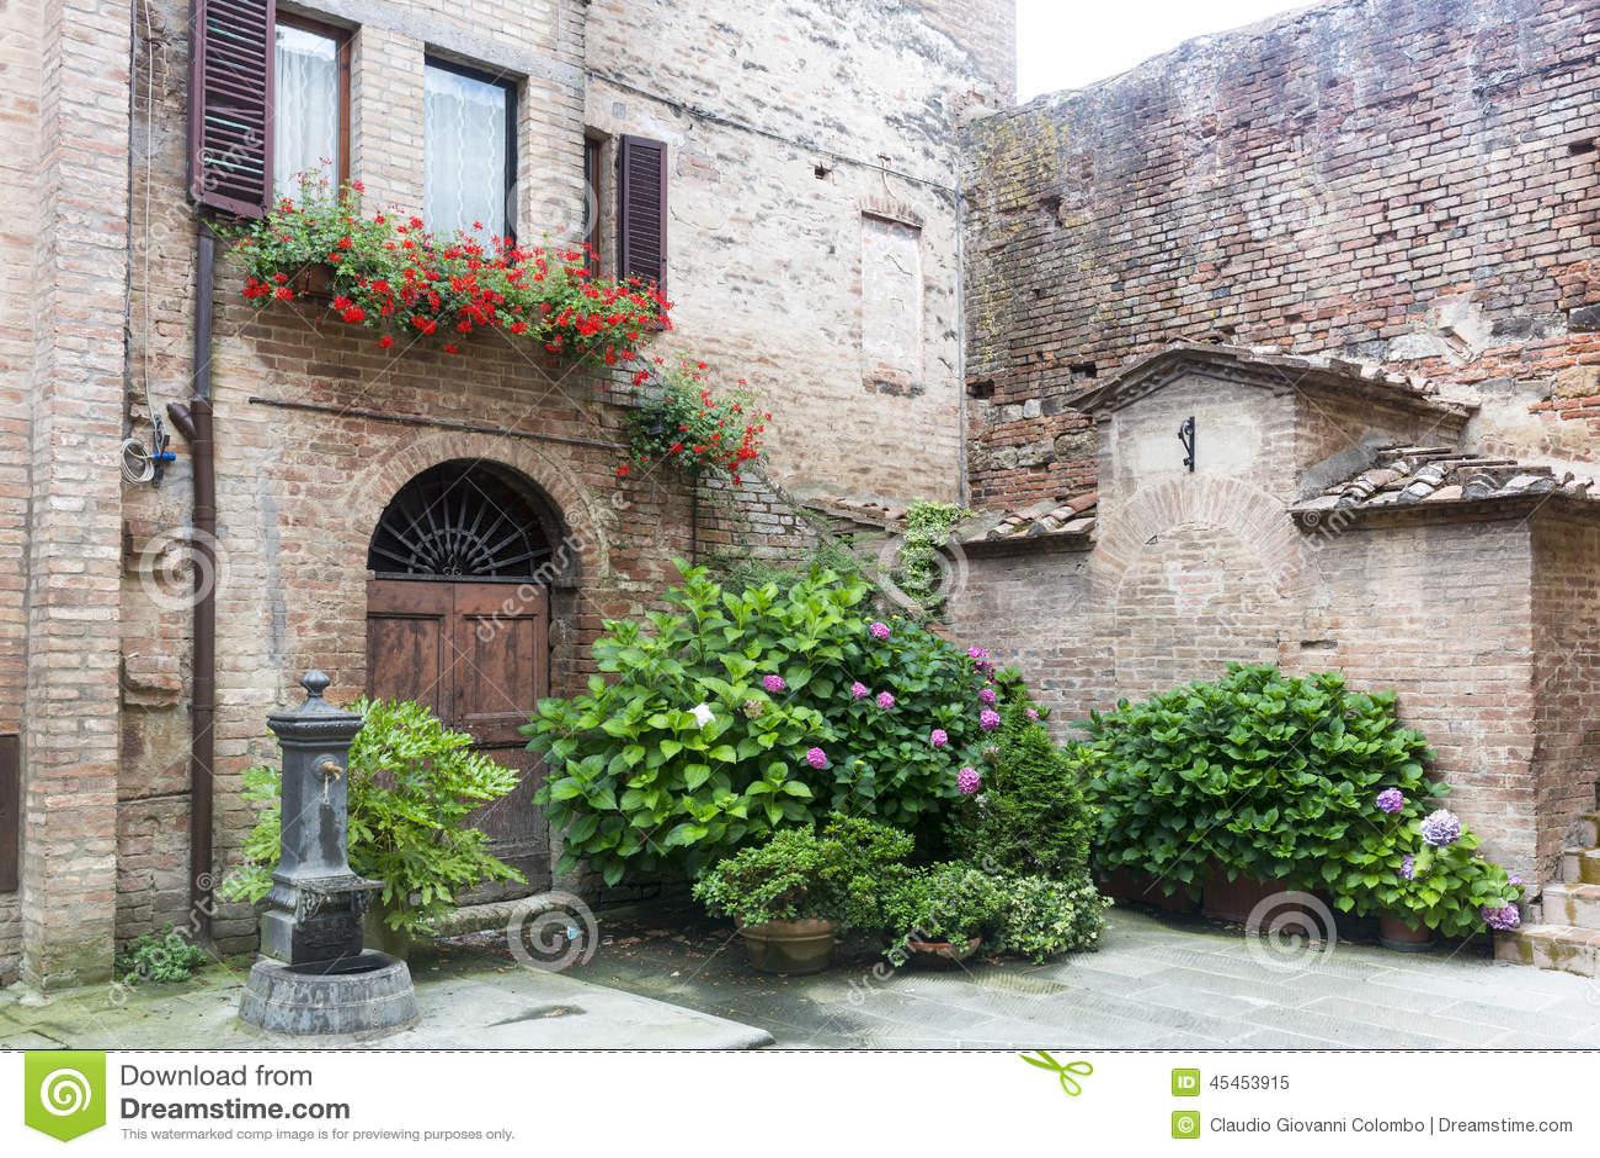 Buonconvento tuscany italy royalty free stock image for Classic house plants